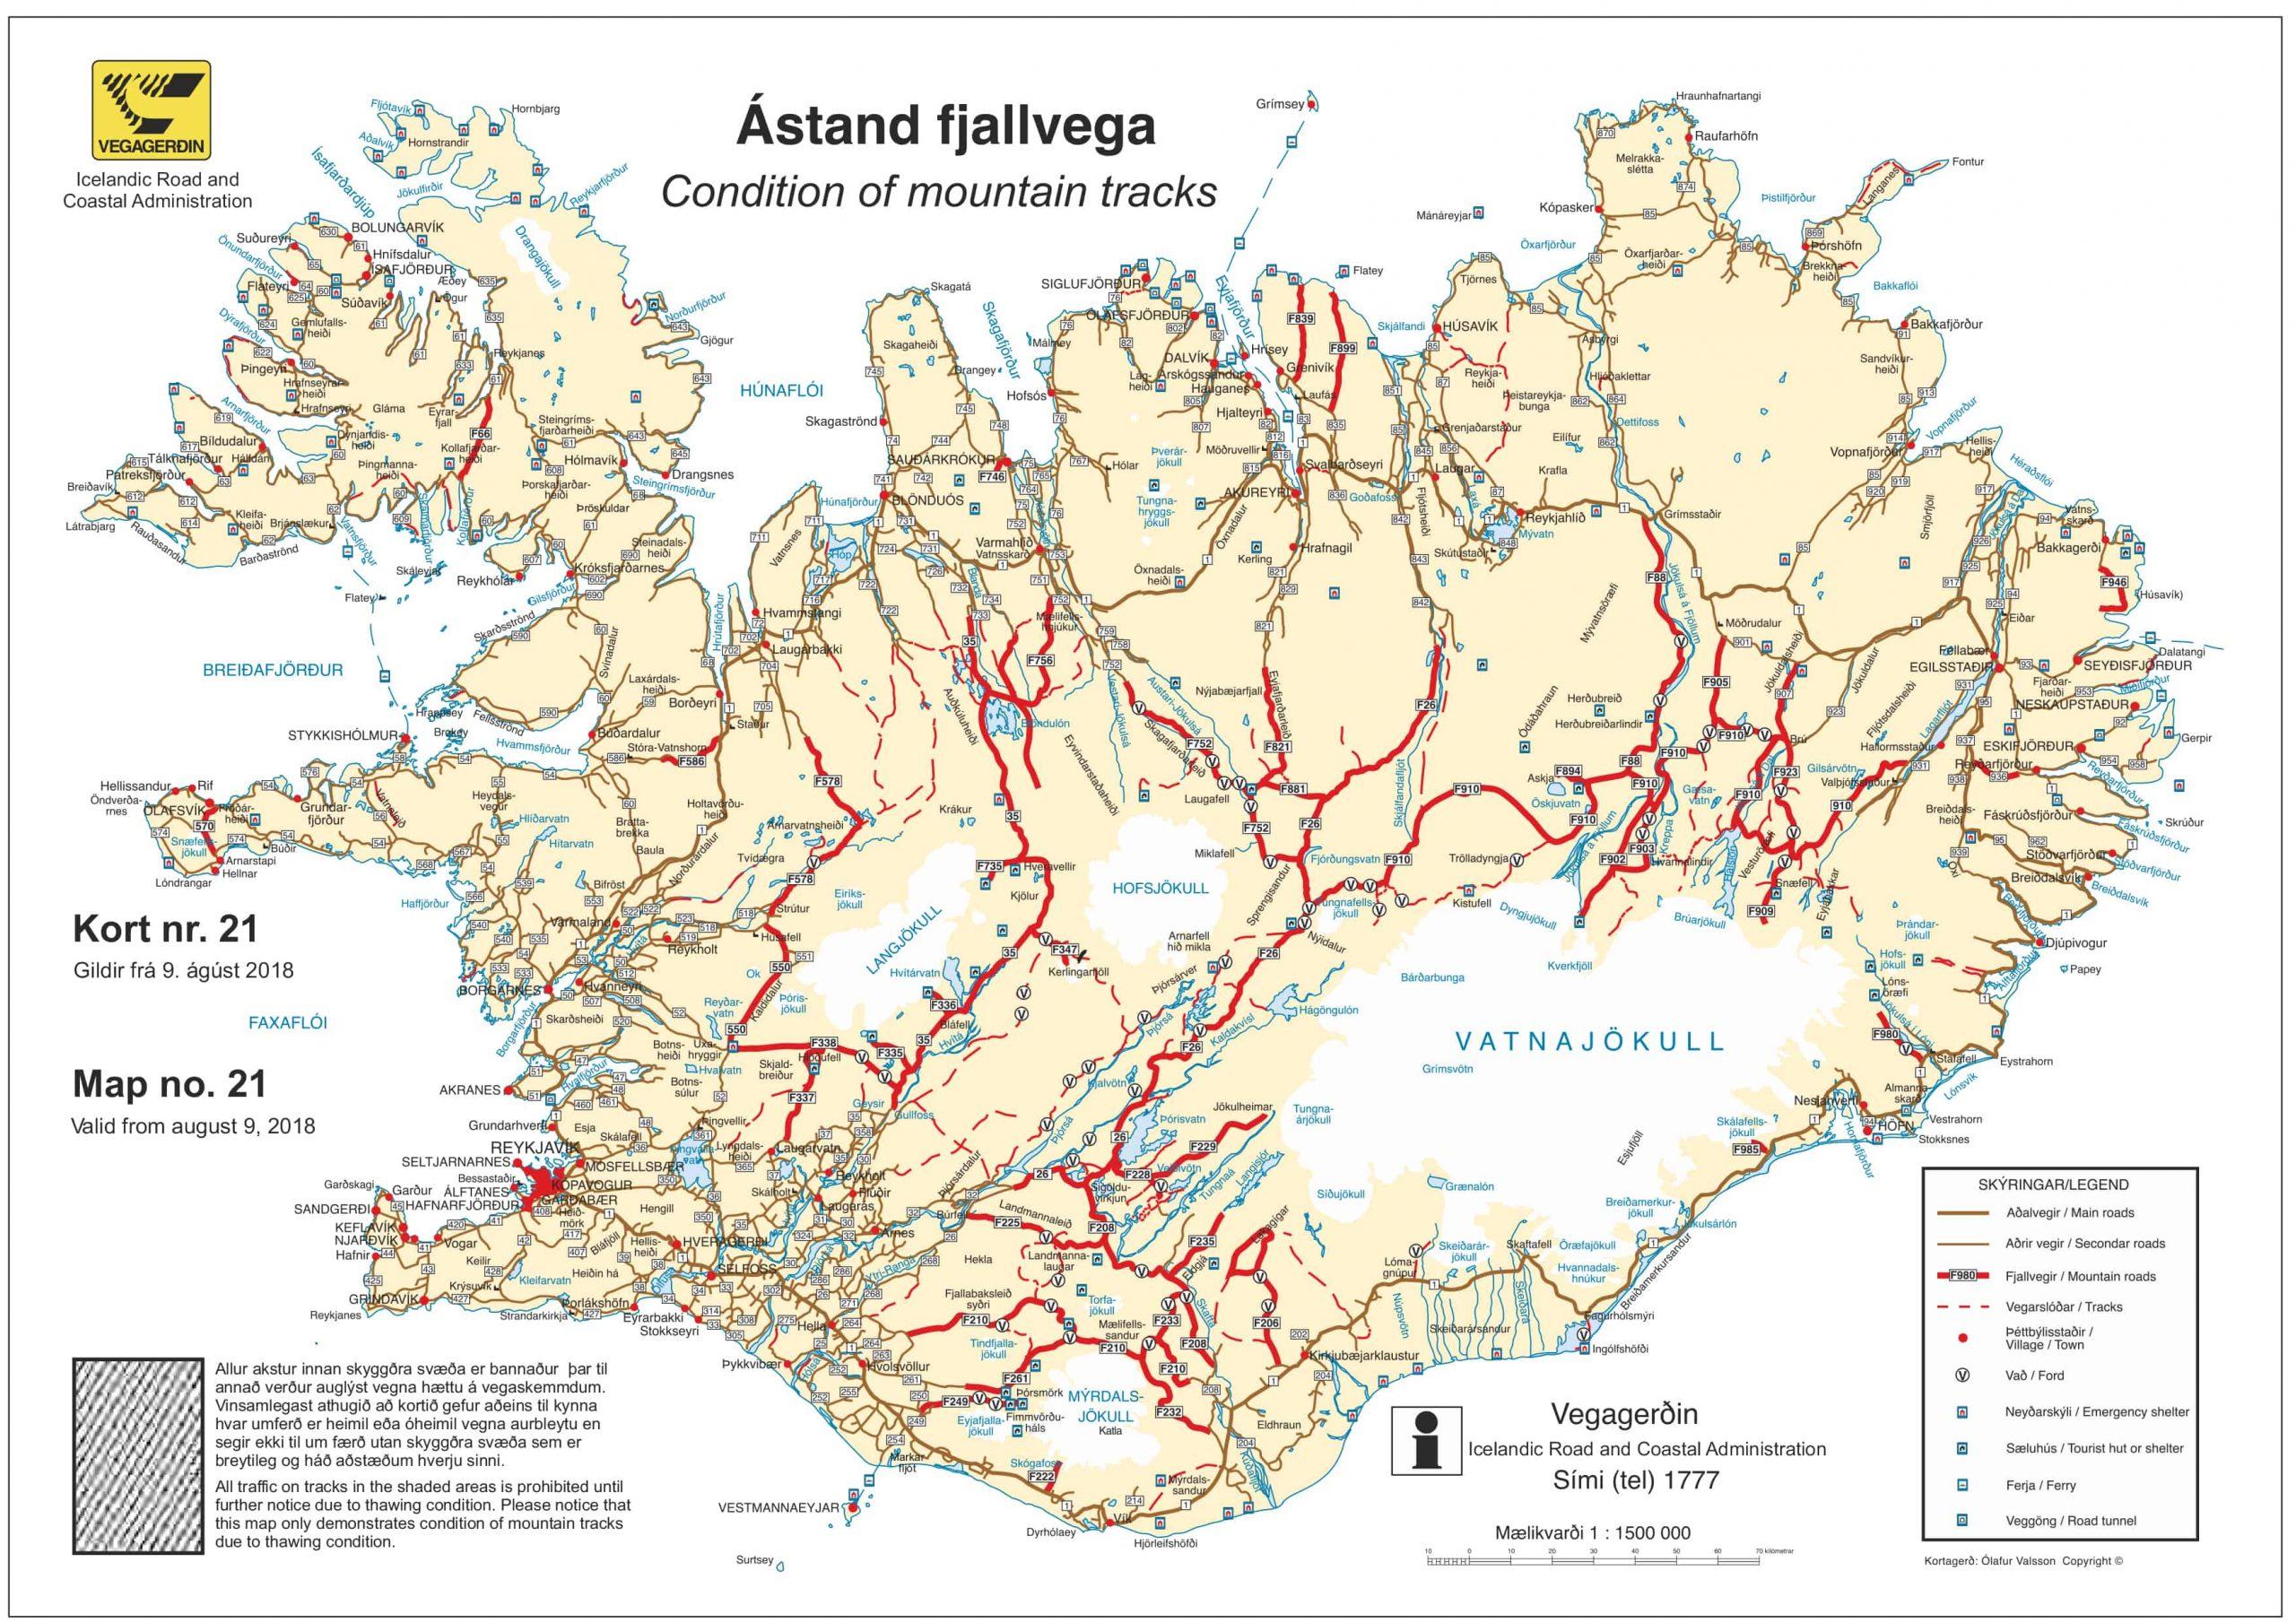 Mapa carreteras Islandia carreteras F Islandia conducir Islandia Iceland Road map 2018